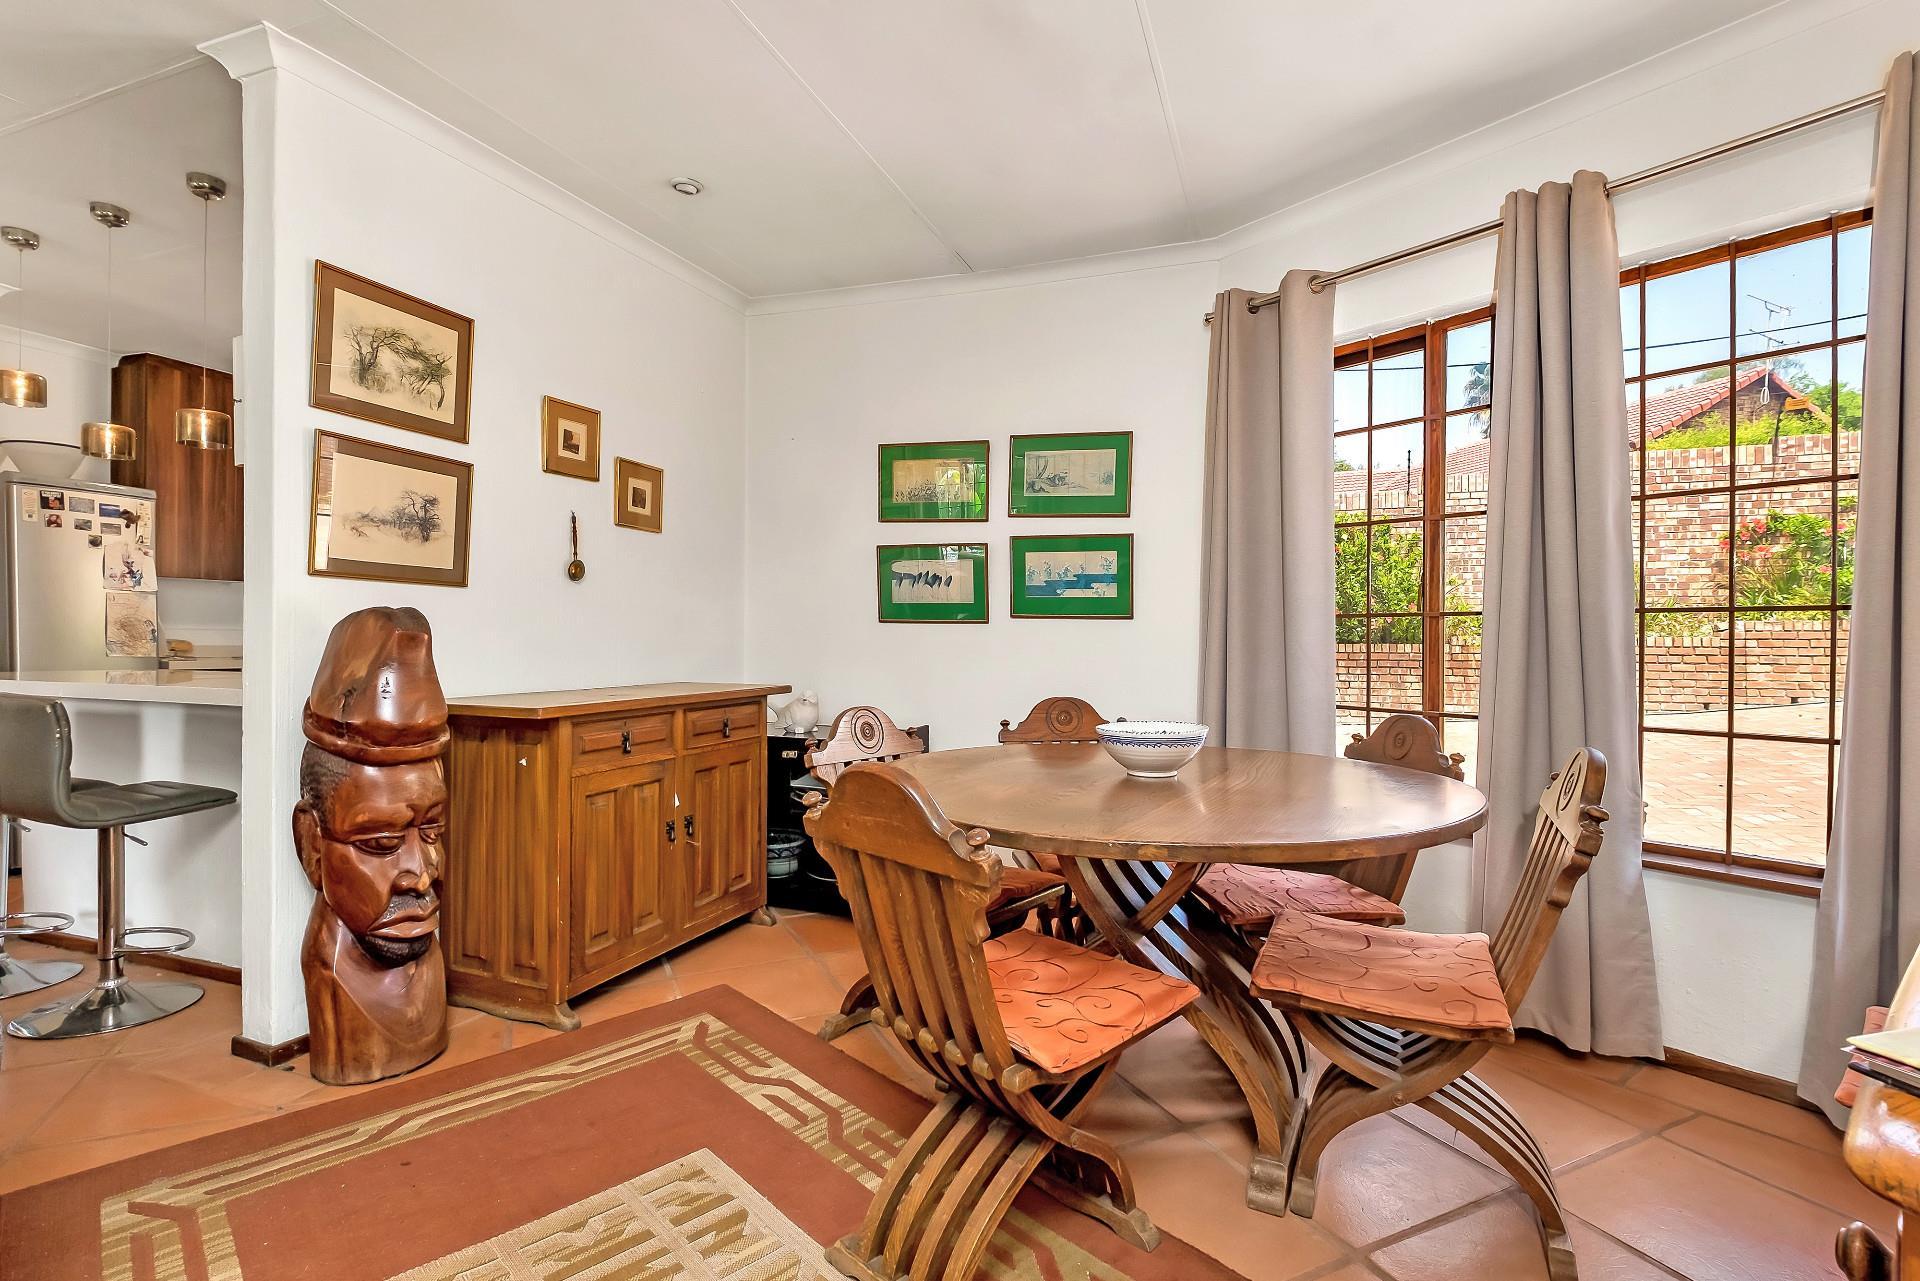 2 Bedroom House For Sale in Jukskei Park